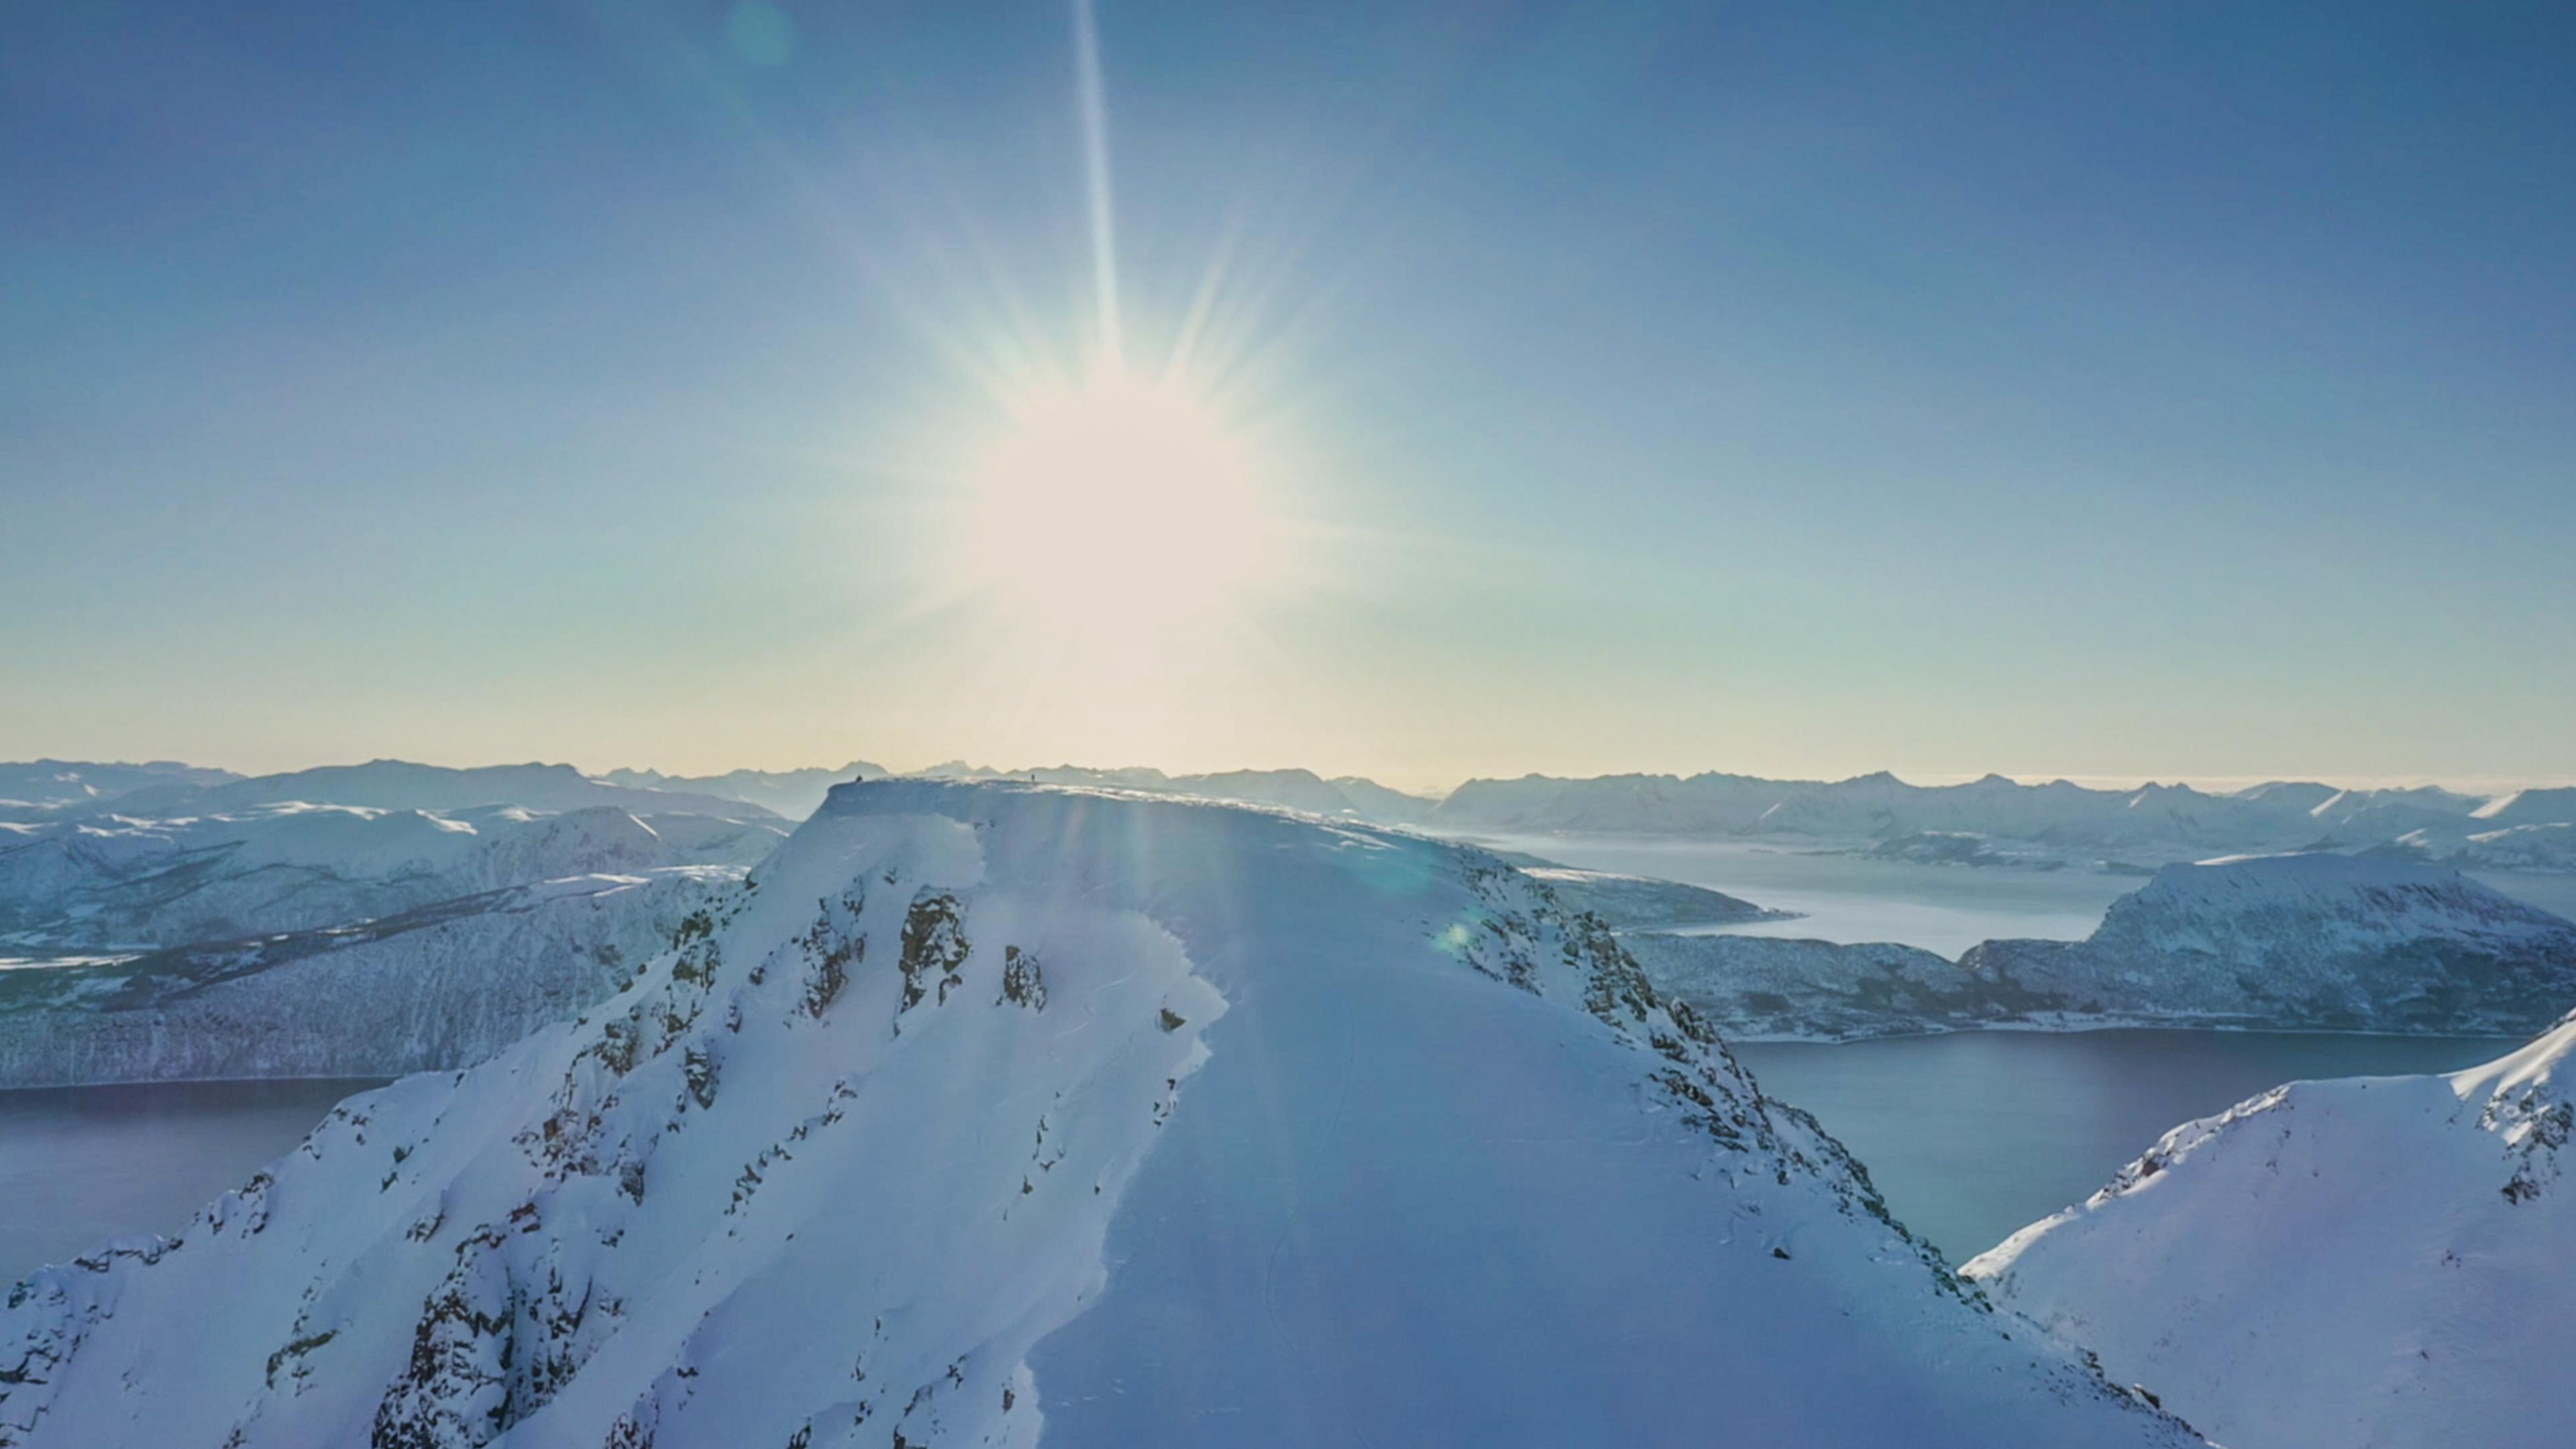 ALCHIMIE II_Grytoya Island_Mountain_Suns